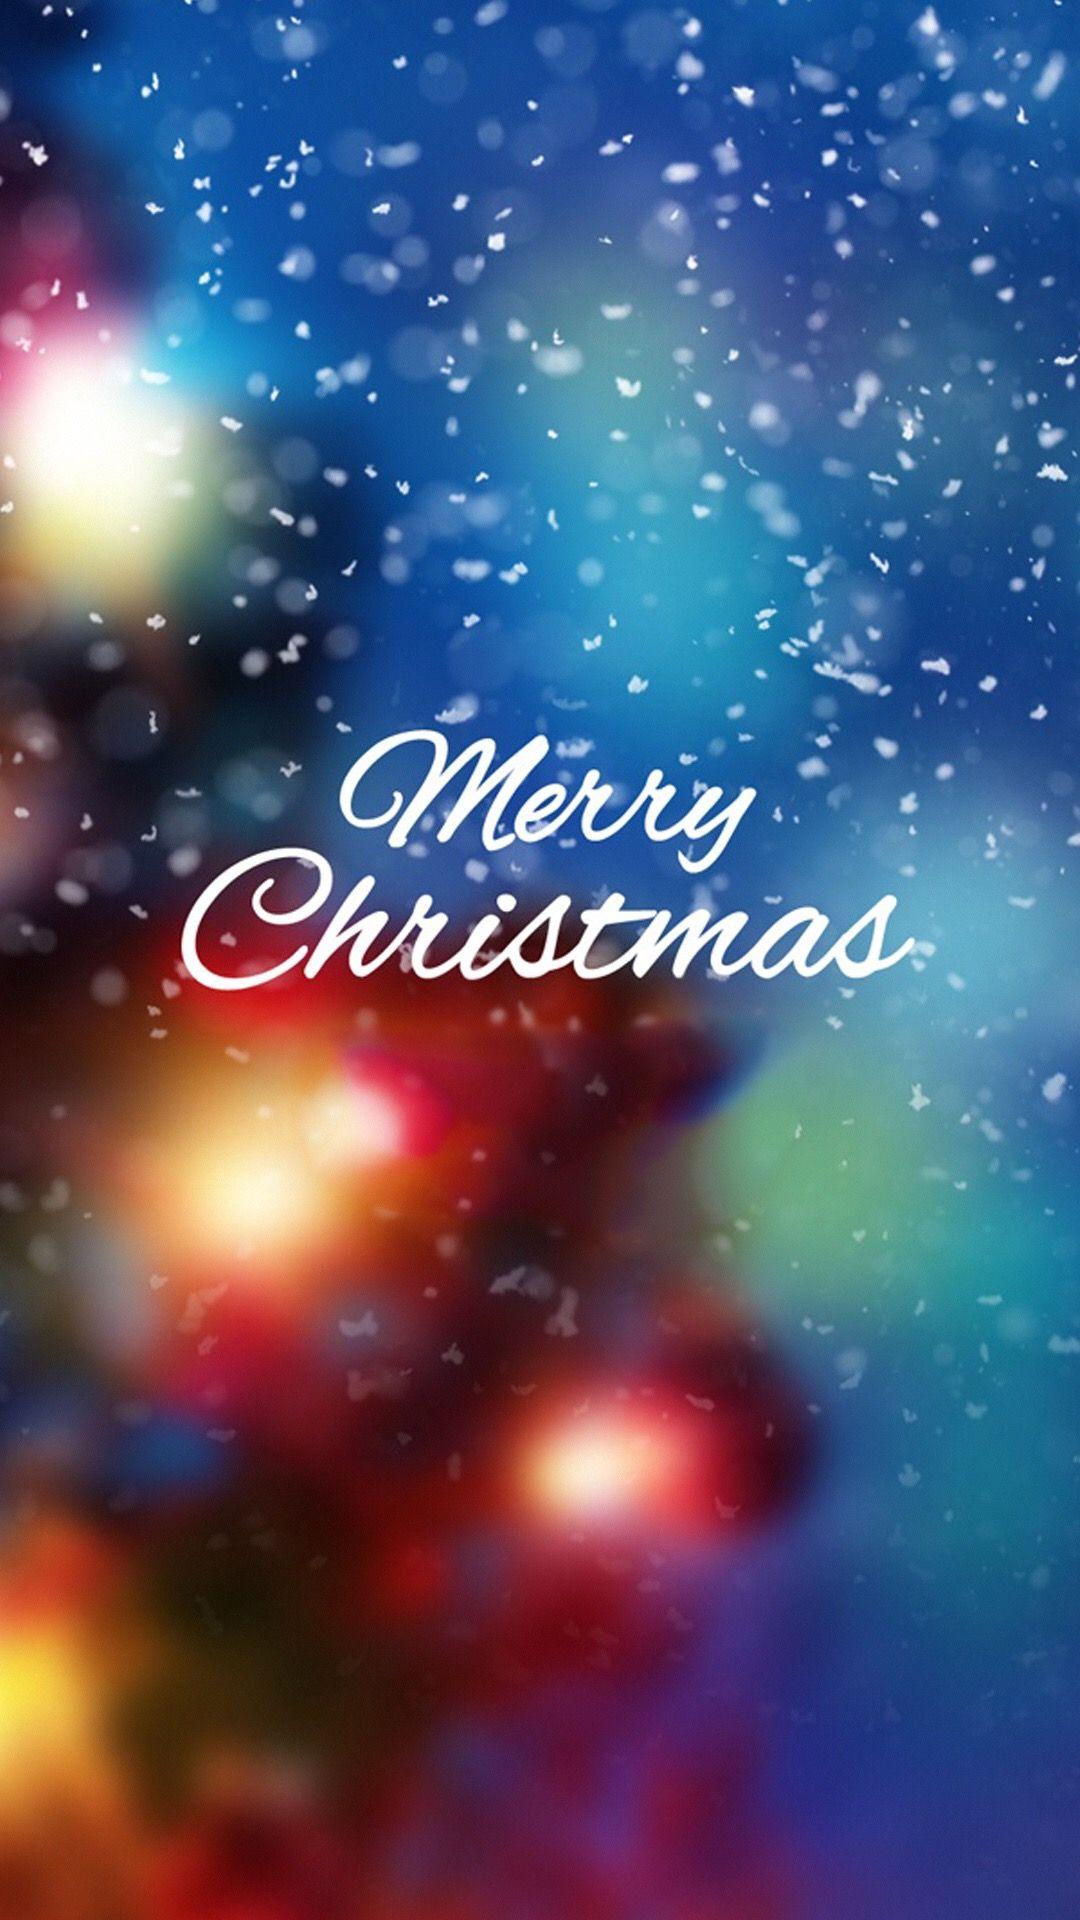 From Zedge App Christmas wallpaper, Christmas magic